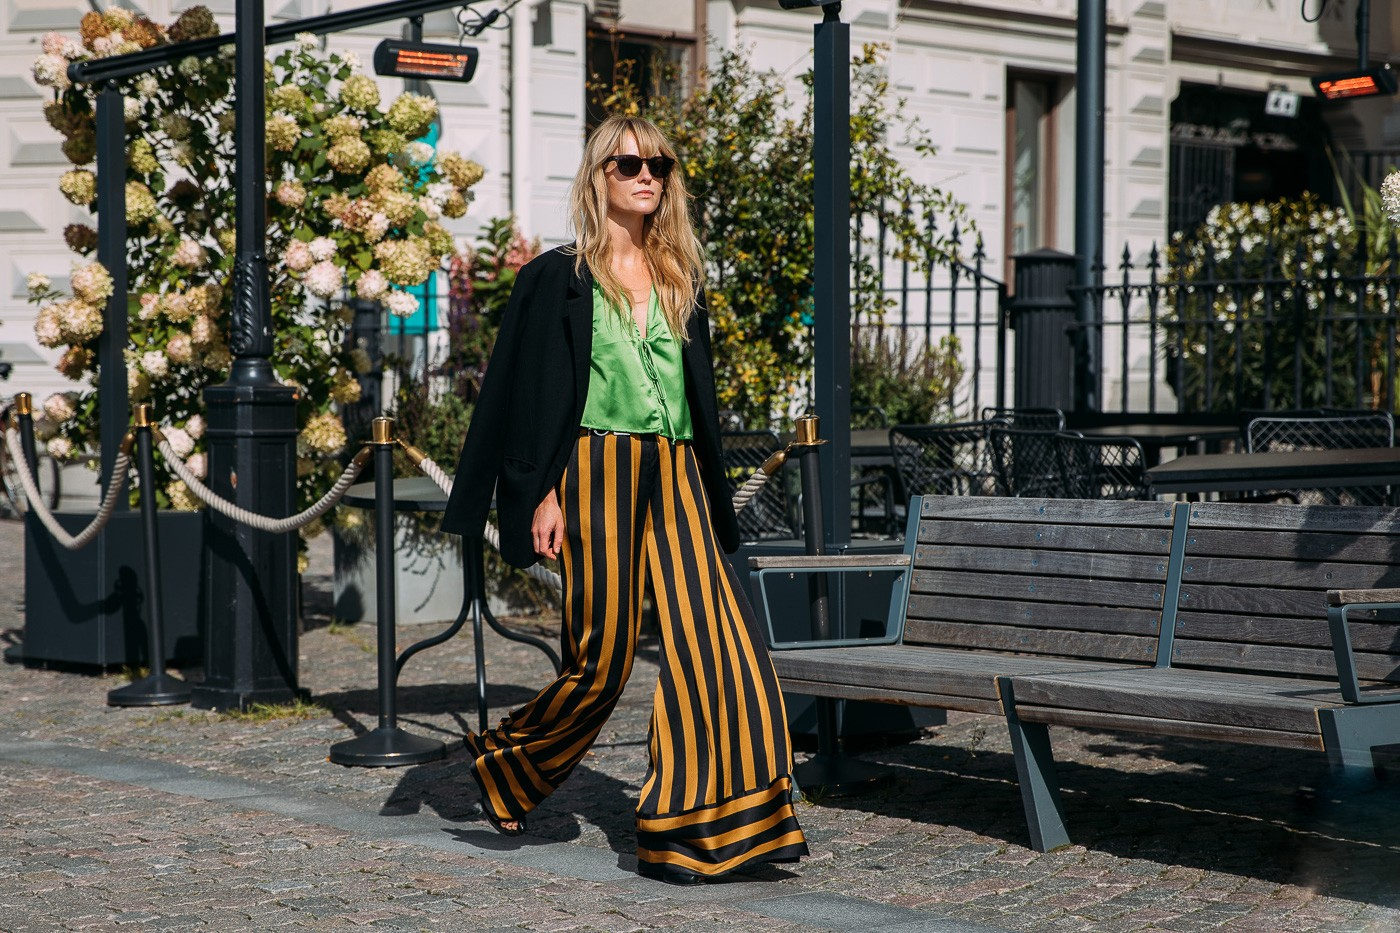 Jeanette Friis Madsen stylebook blazers 2018 edit seven